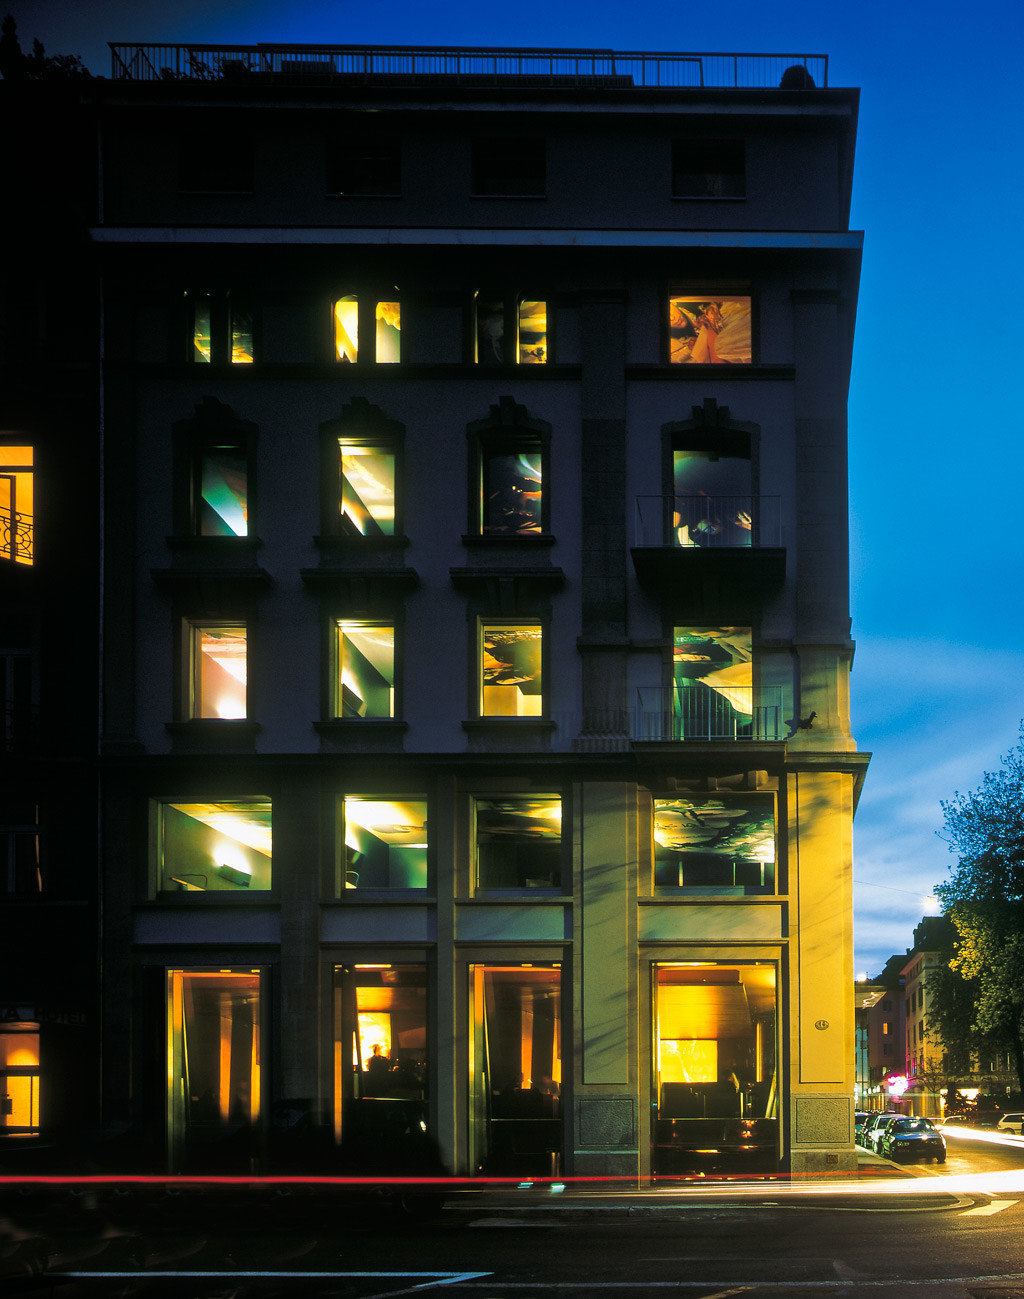 Architecture Boutique Buildings Exterior night light lighting evening City